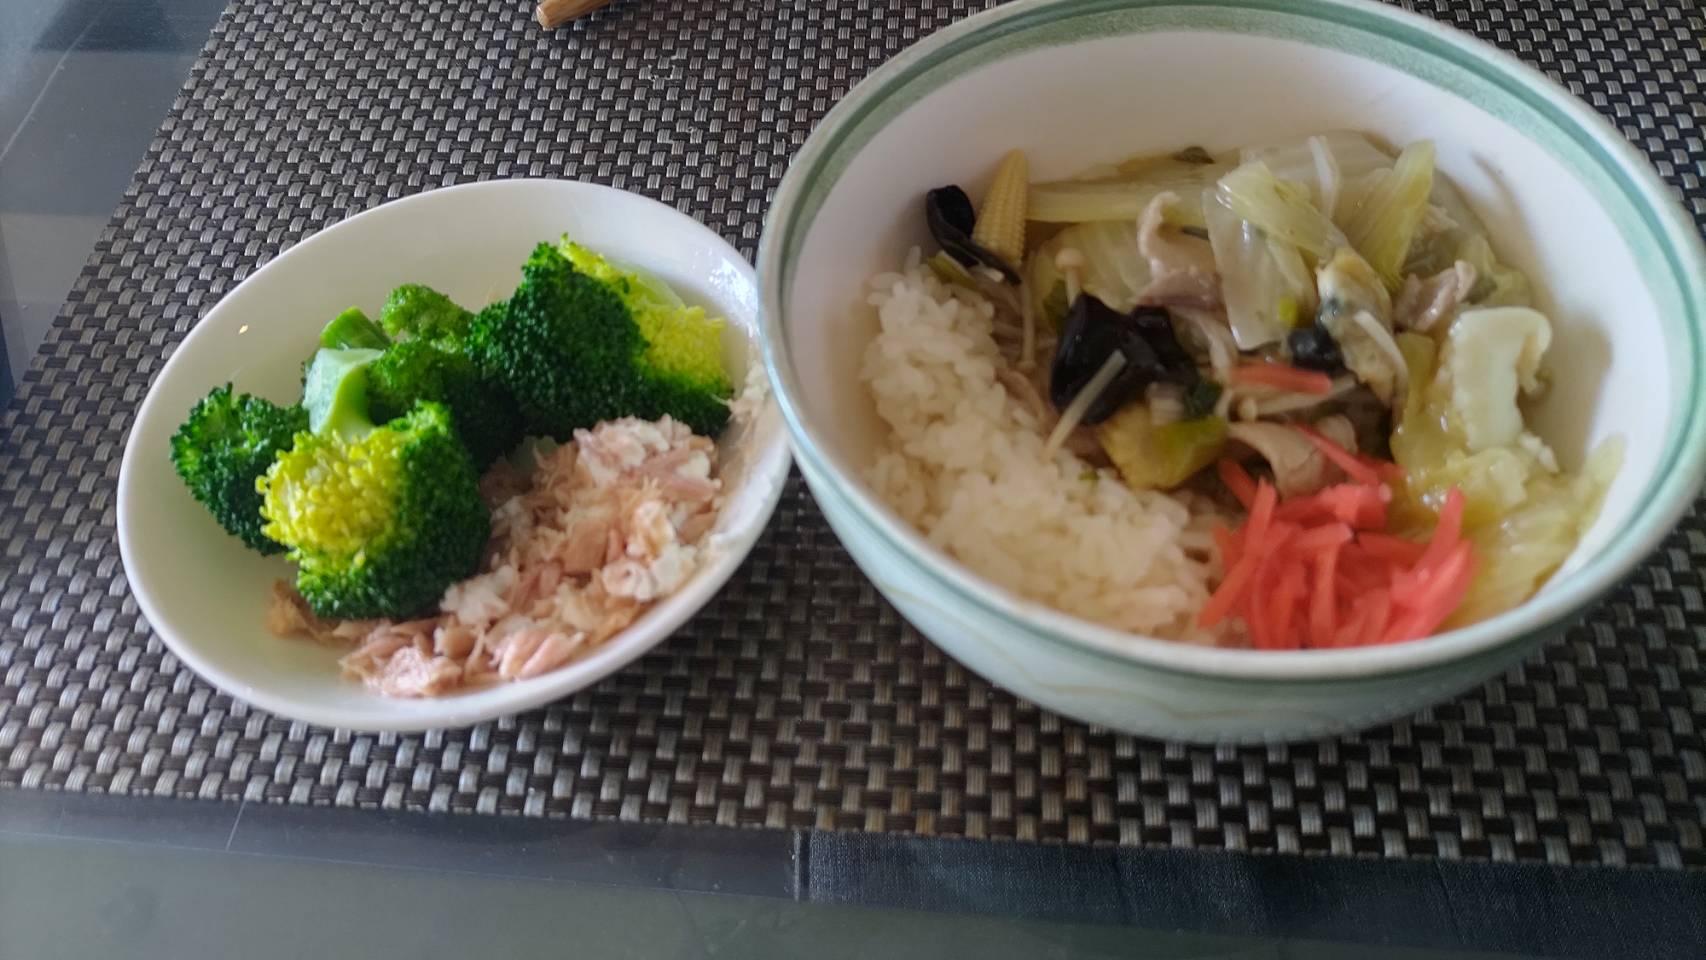 LINE30日食事アドバイス / 各々の生活にあった最適な食生活を見つけます!